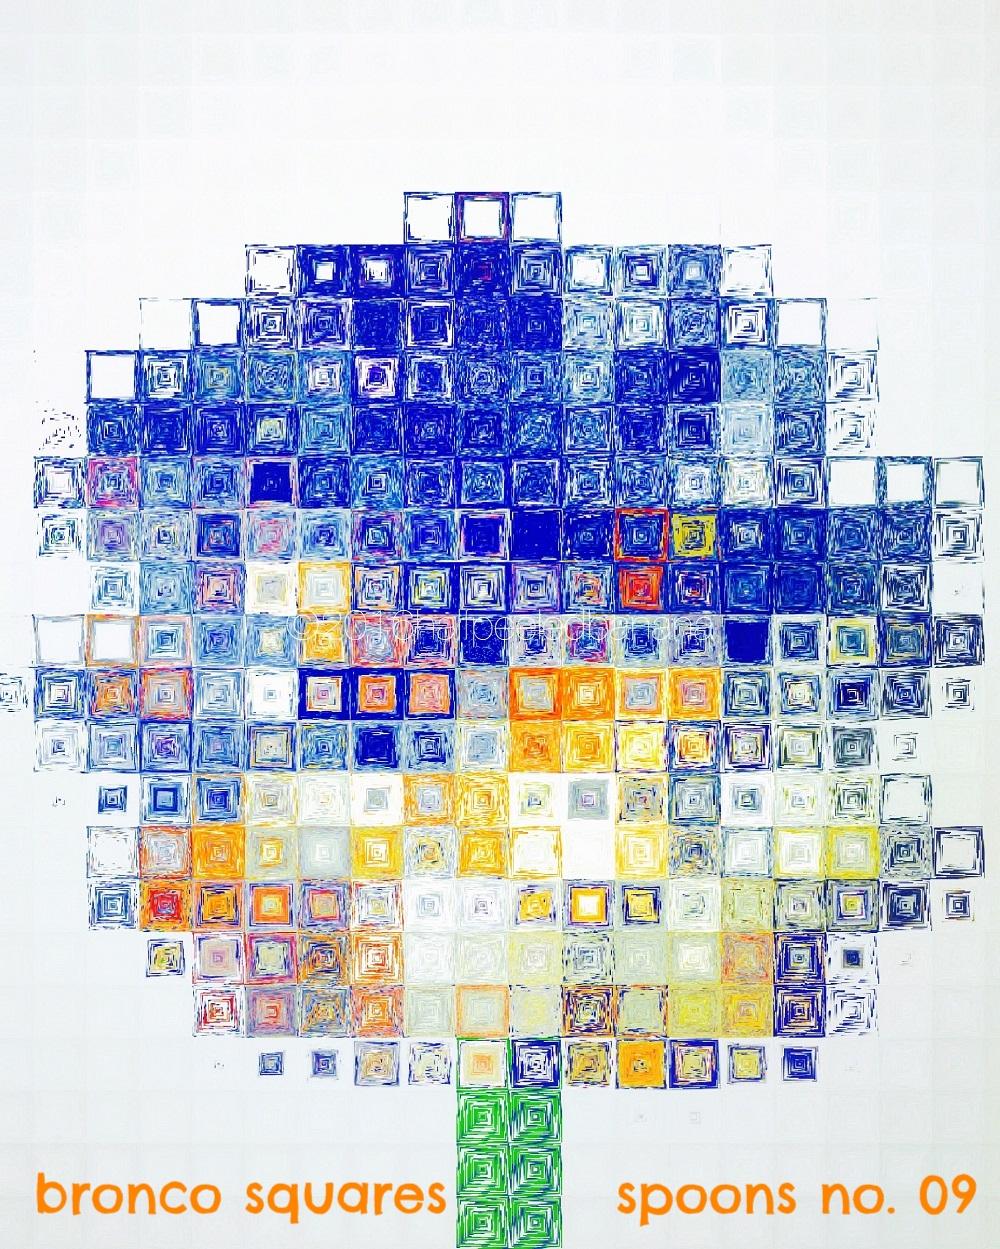 bronco squares